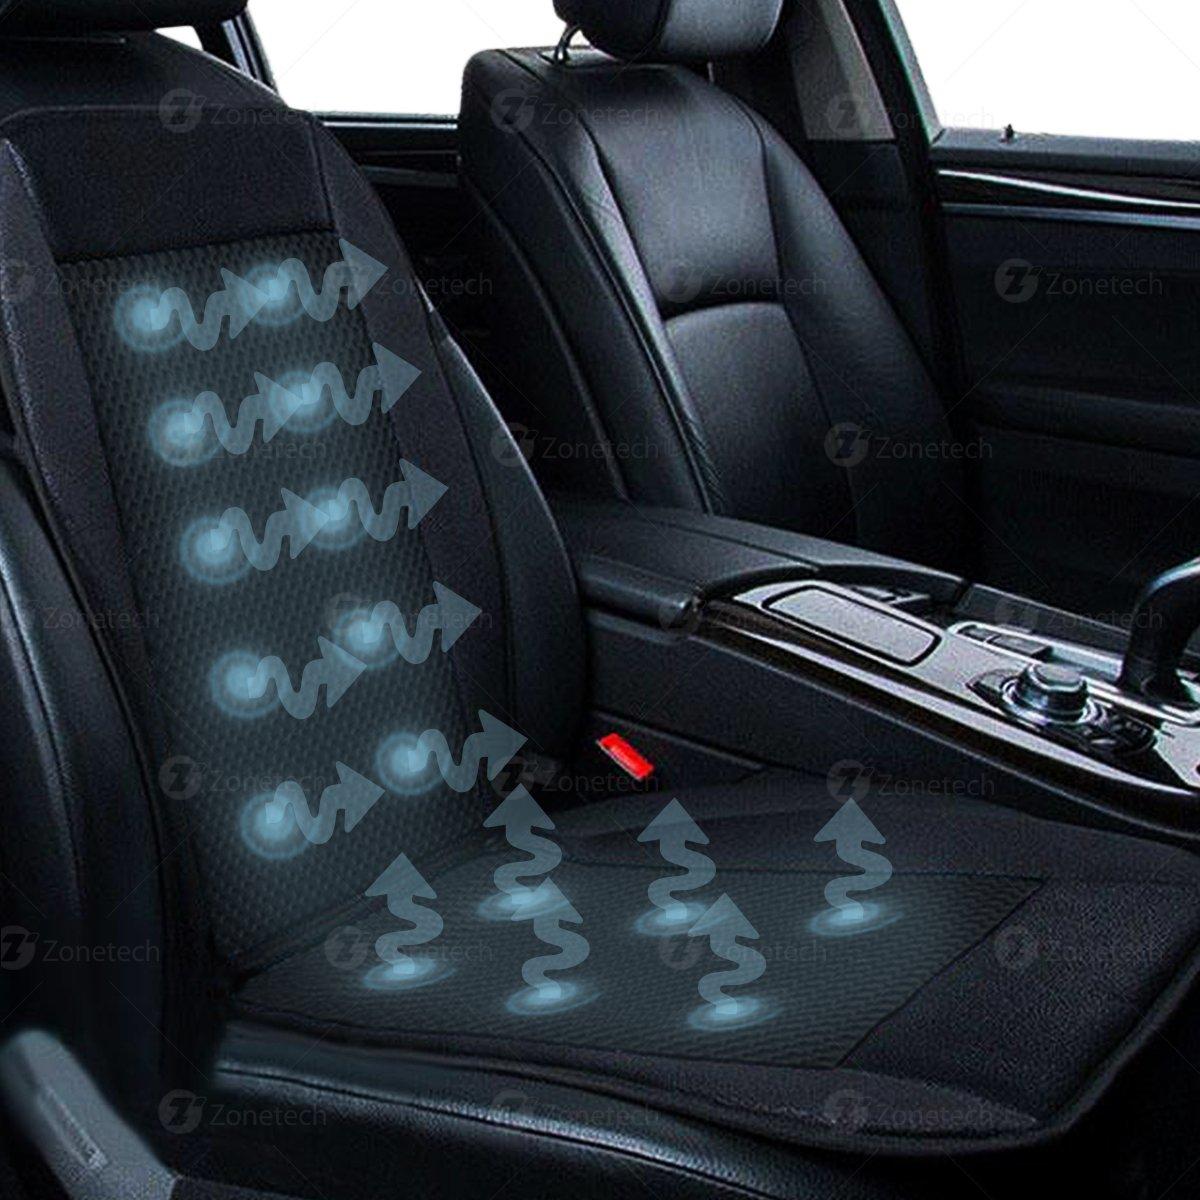 Zone Tech 2x Black Cooling Car Seat Cushion Cooler 12V Adjustable